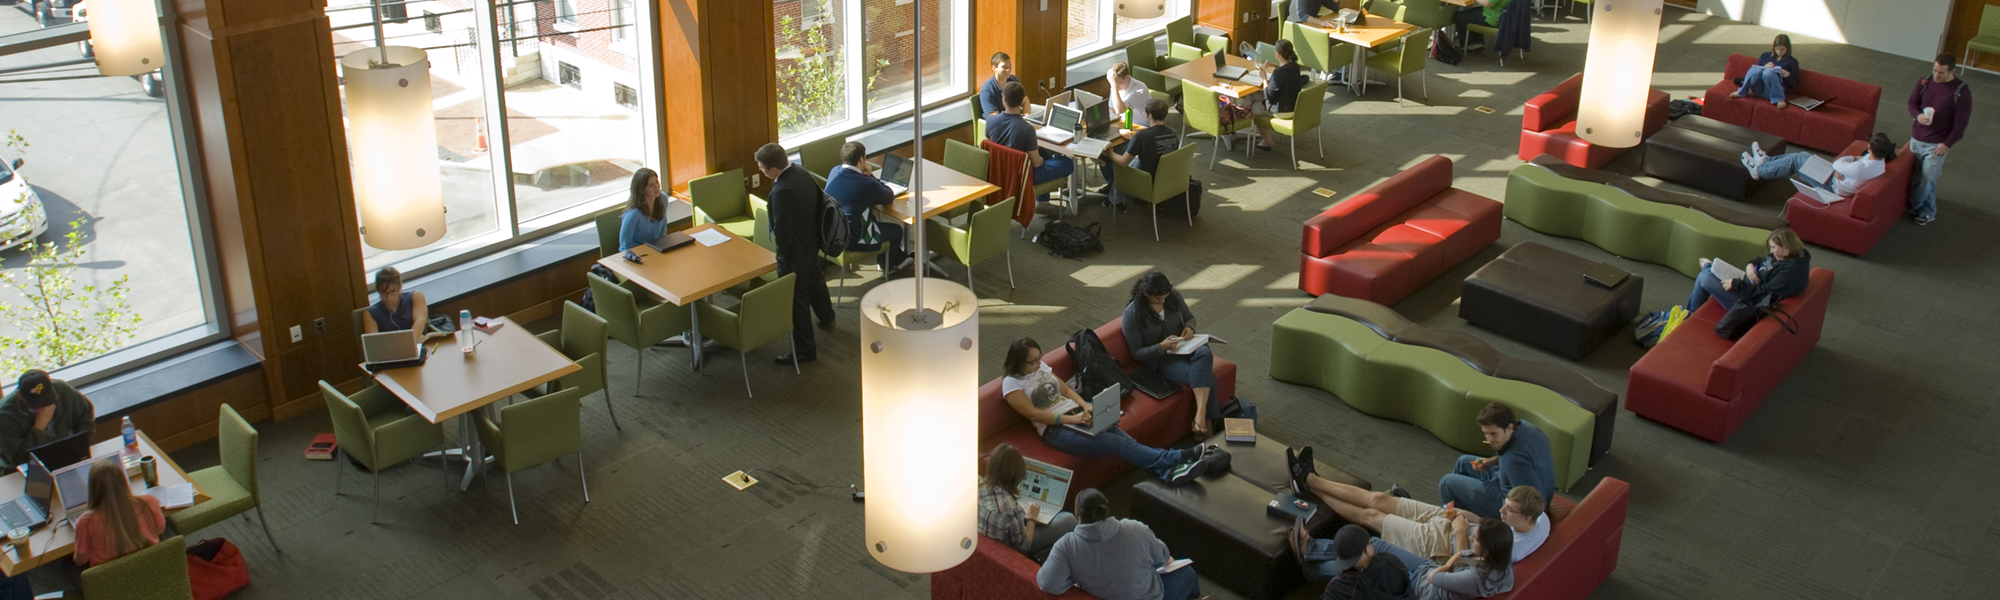 Camden law school campus student lounge